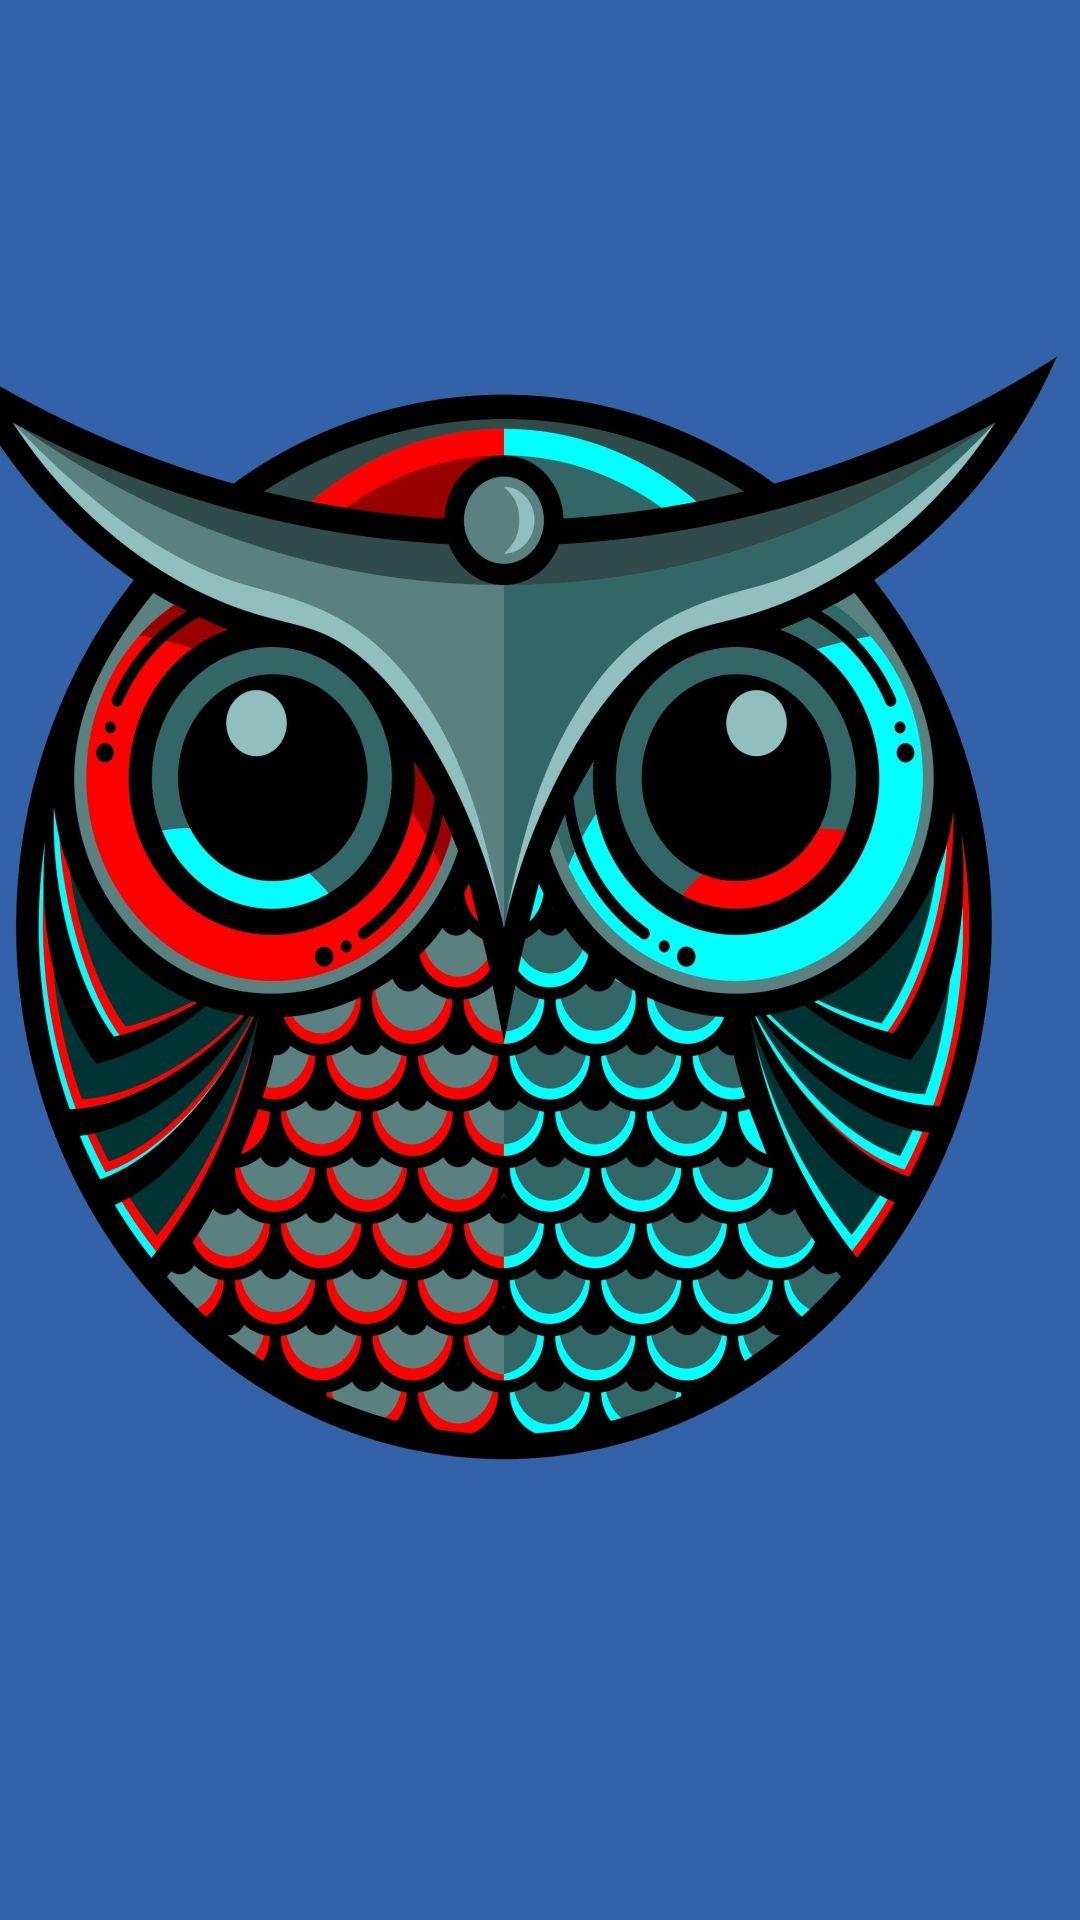 Artistic Owl 1080x1920 Mobile Wallpaper Artistic Wallpapers Wallpaper Geometric Owl